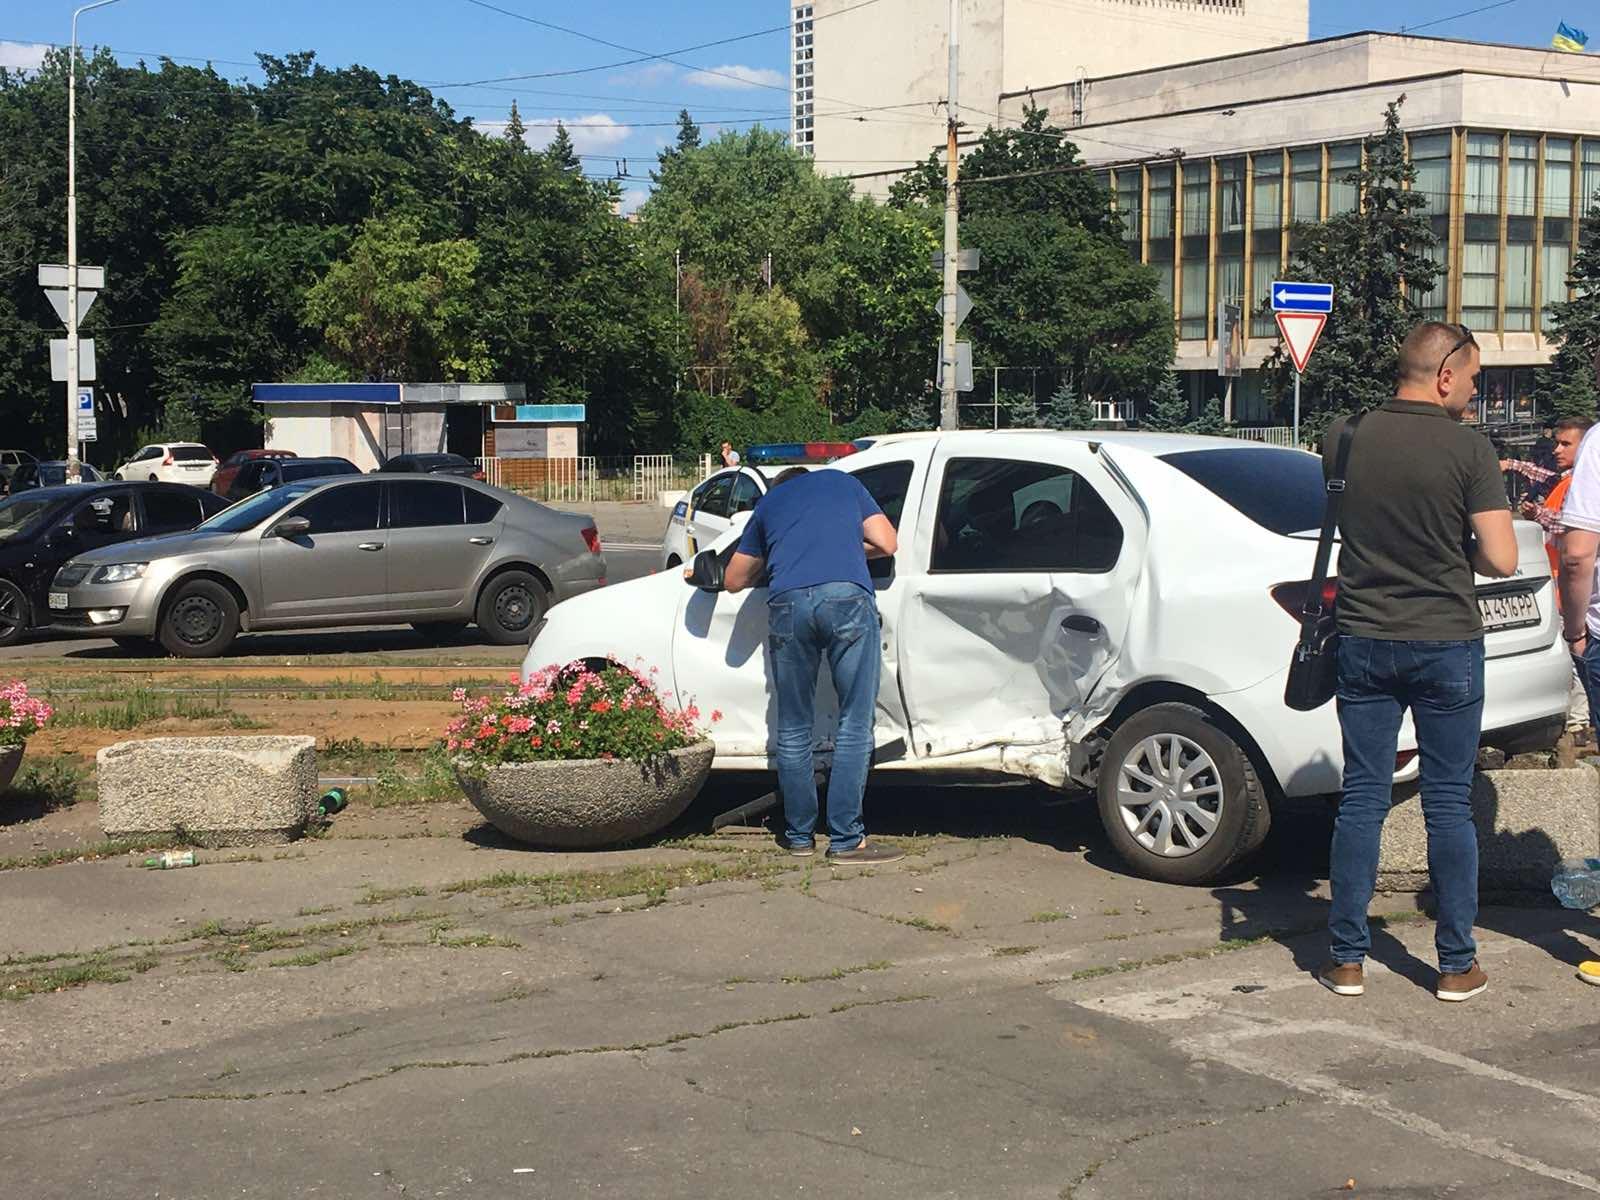 Из-за ДТП на центральном проспекте Днепра остановились трамваи. Новости Днепра